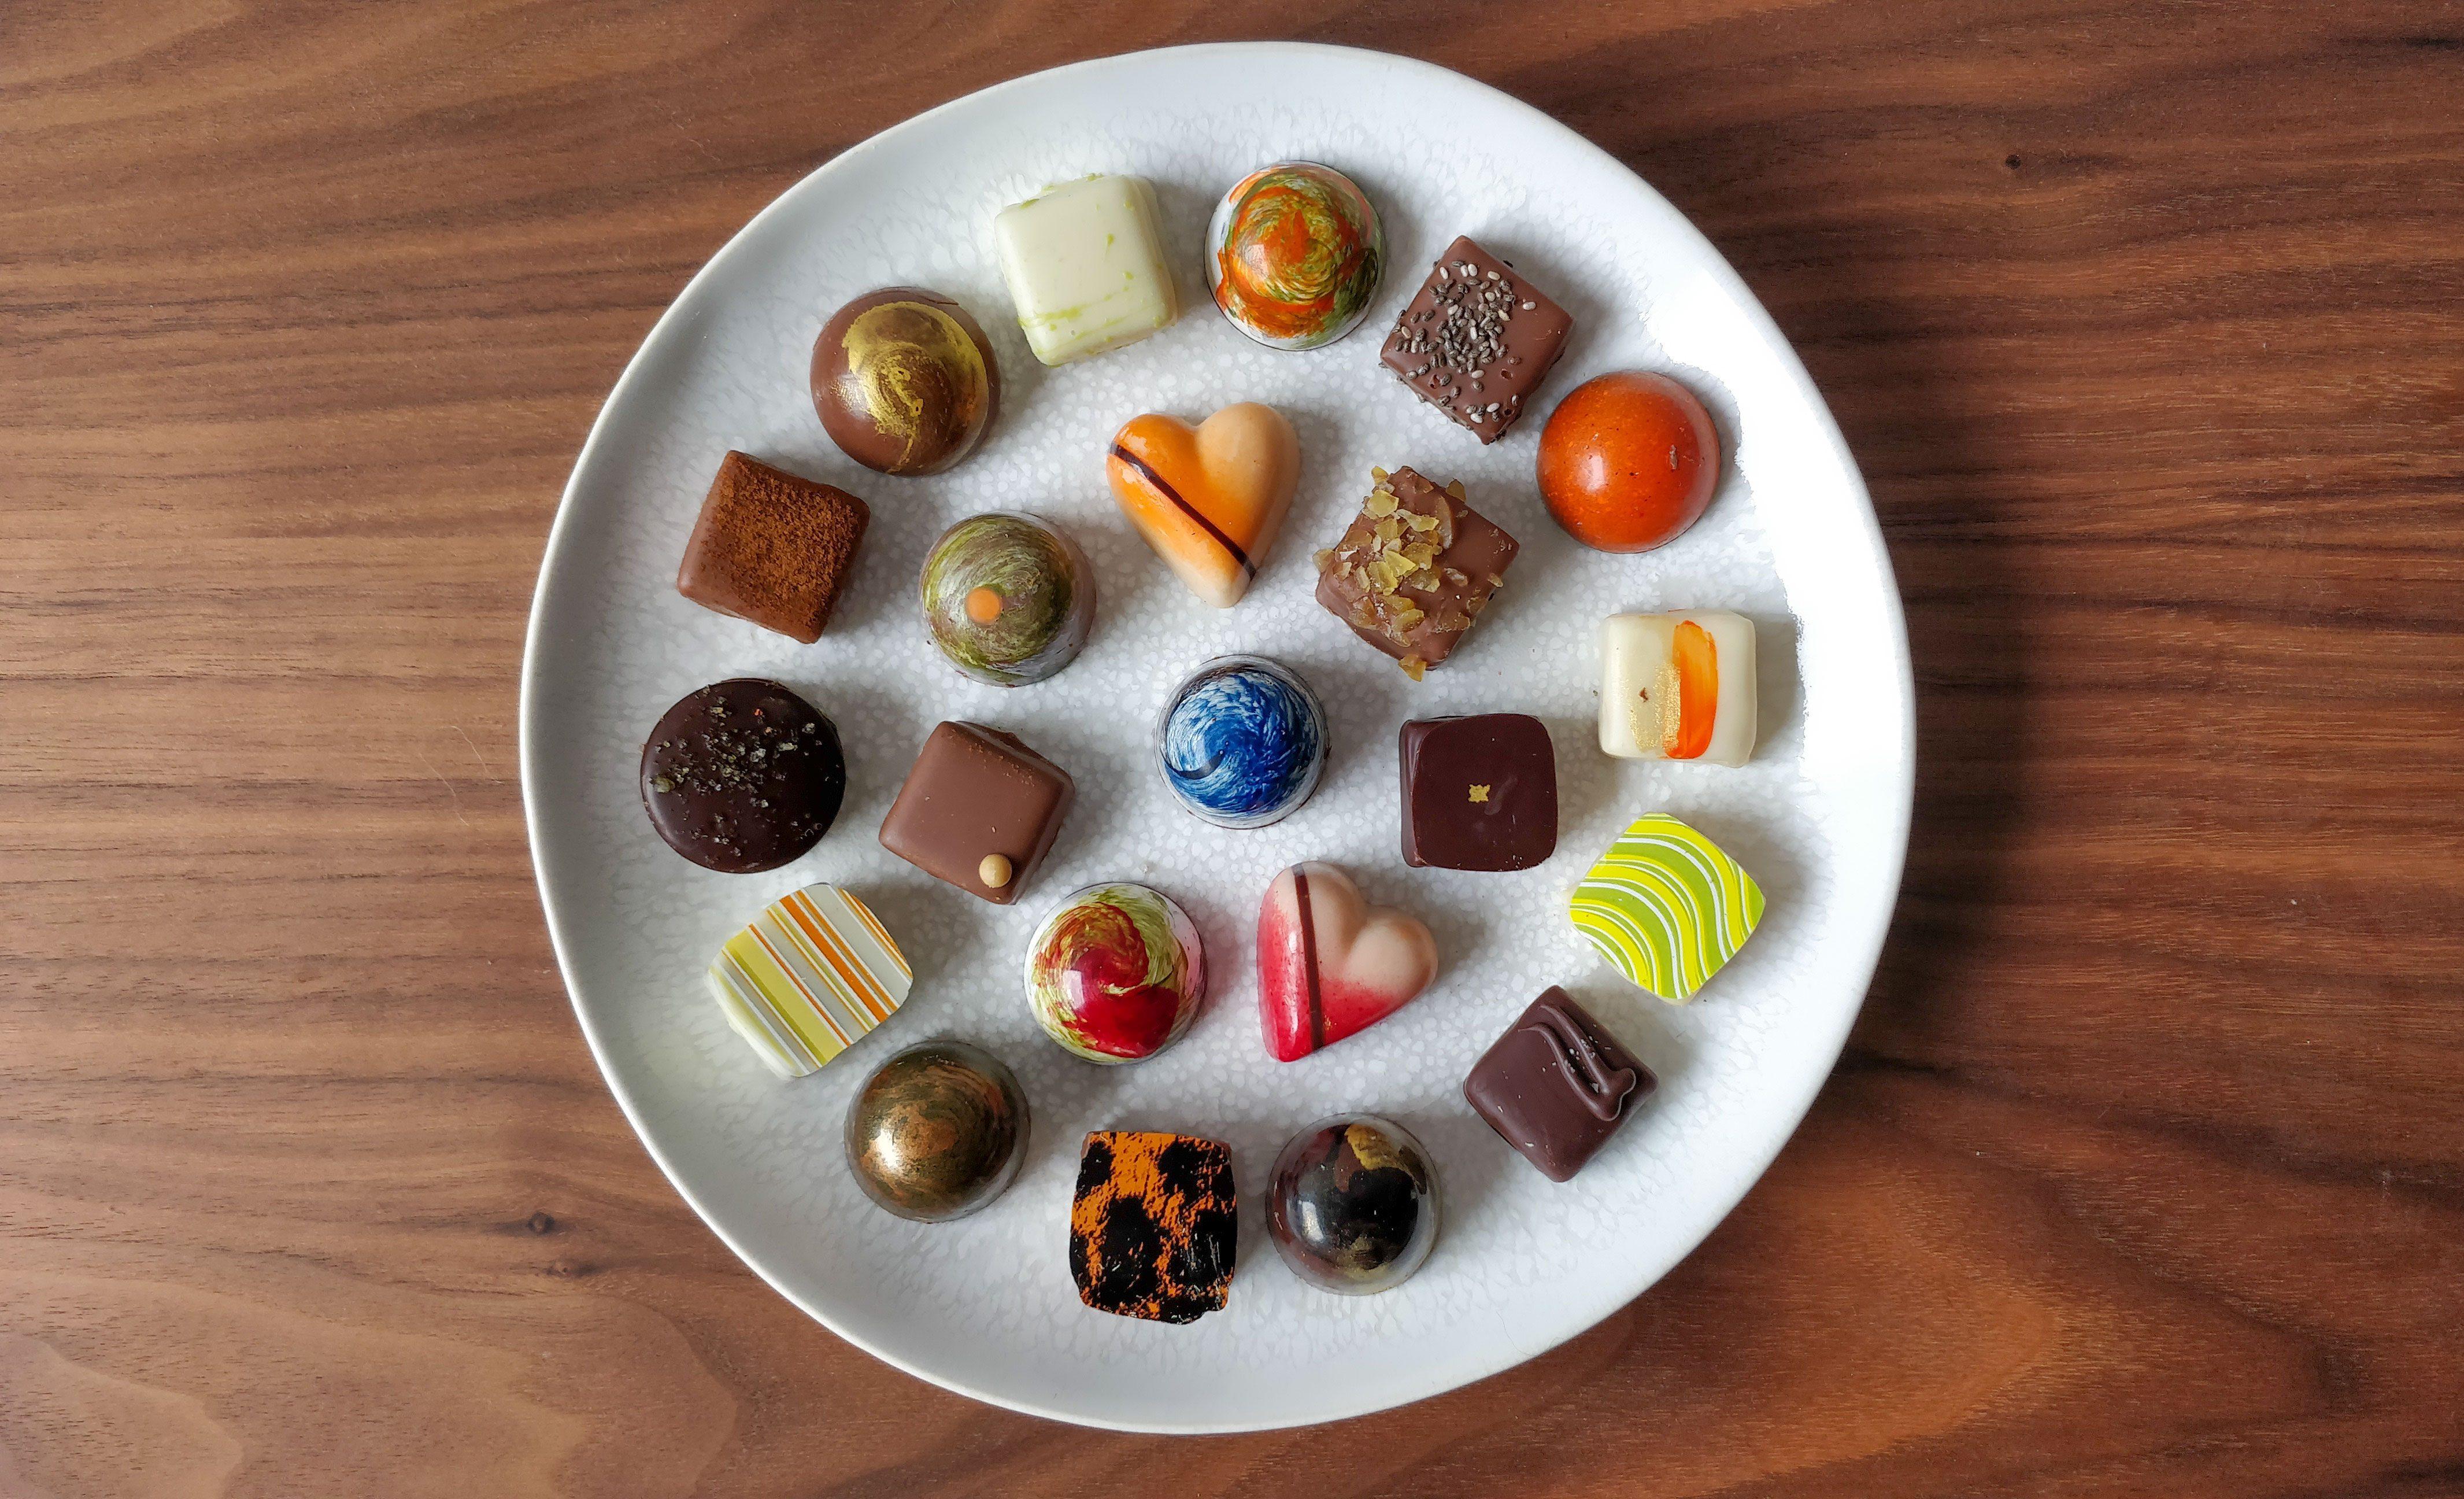 ChocolaDeCacaofabriek – Chocolates worth the detour